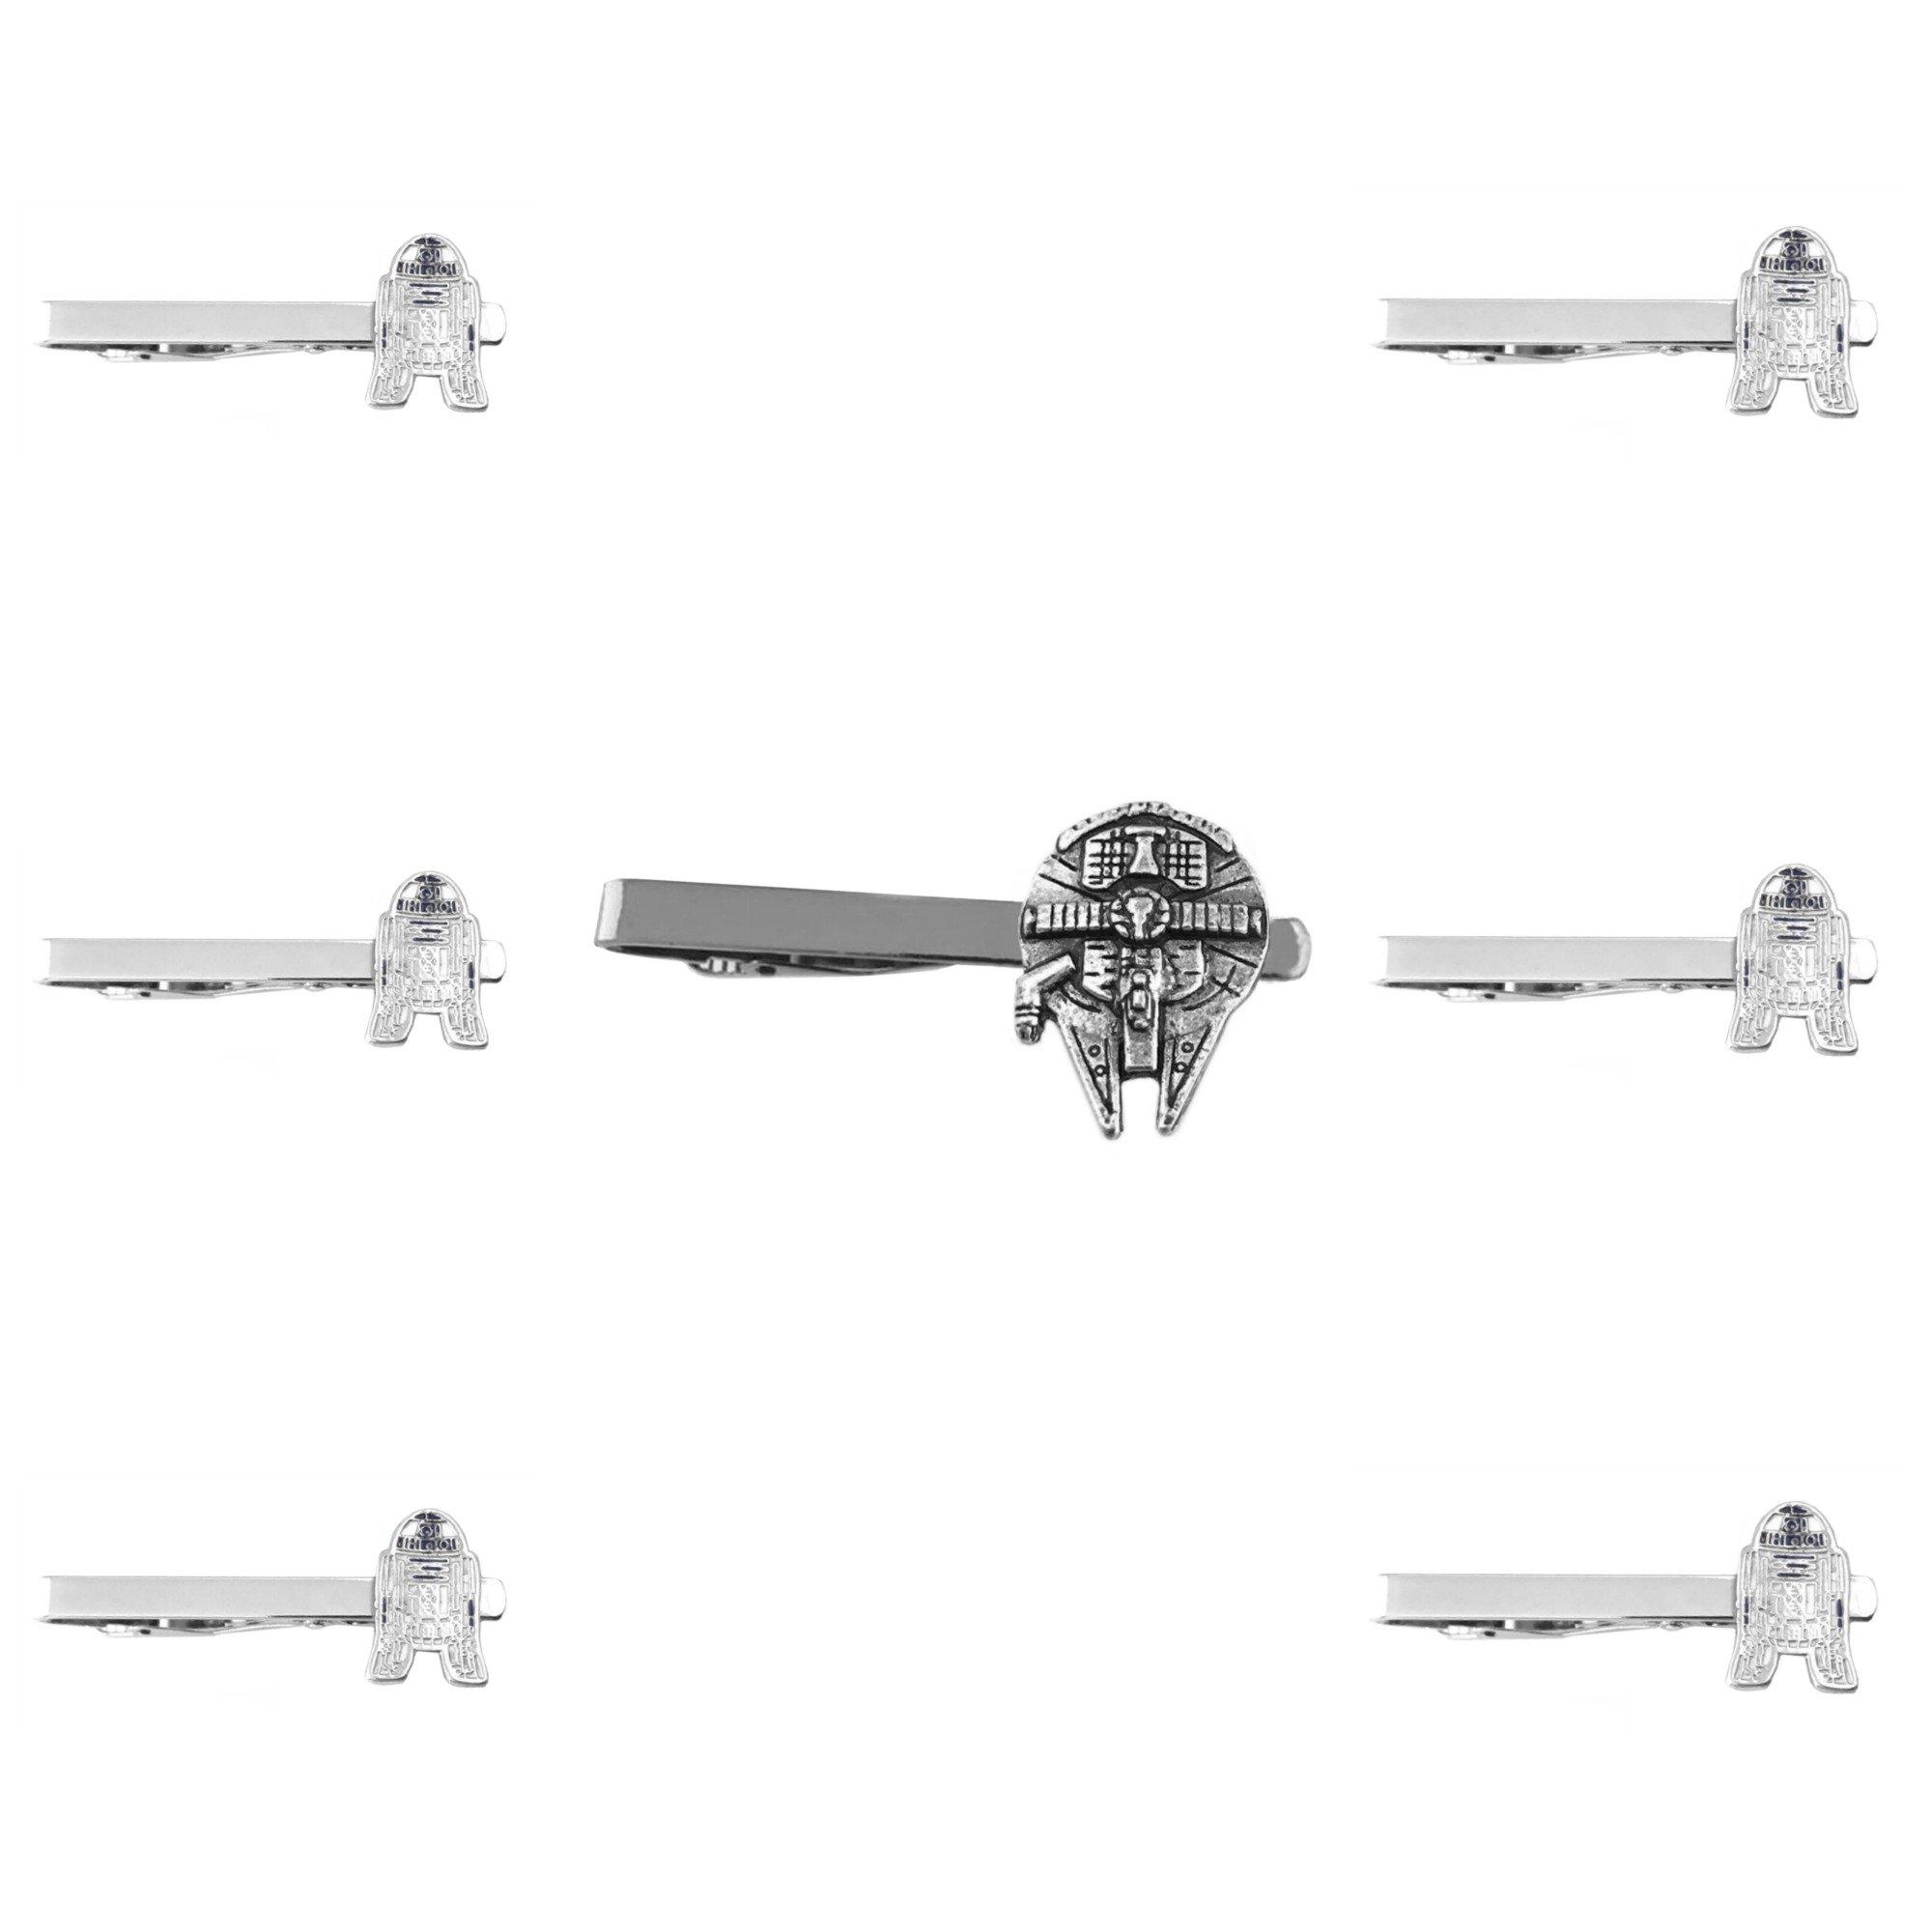 Outlander Star Wars - Millenium Falcon & R2-D2 - Tiebar Tie Clasp Set of 7 Wedding Superhero Logo w/Gift Box